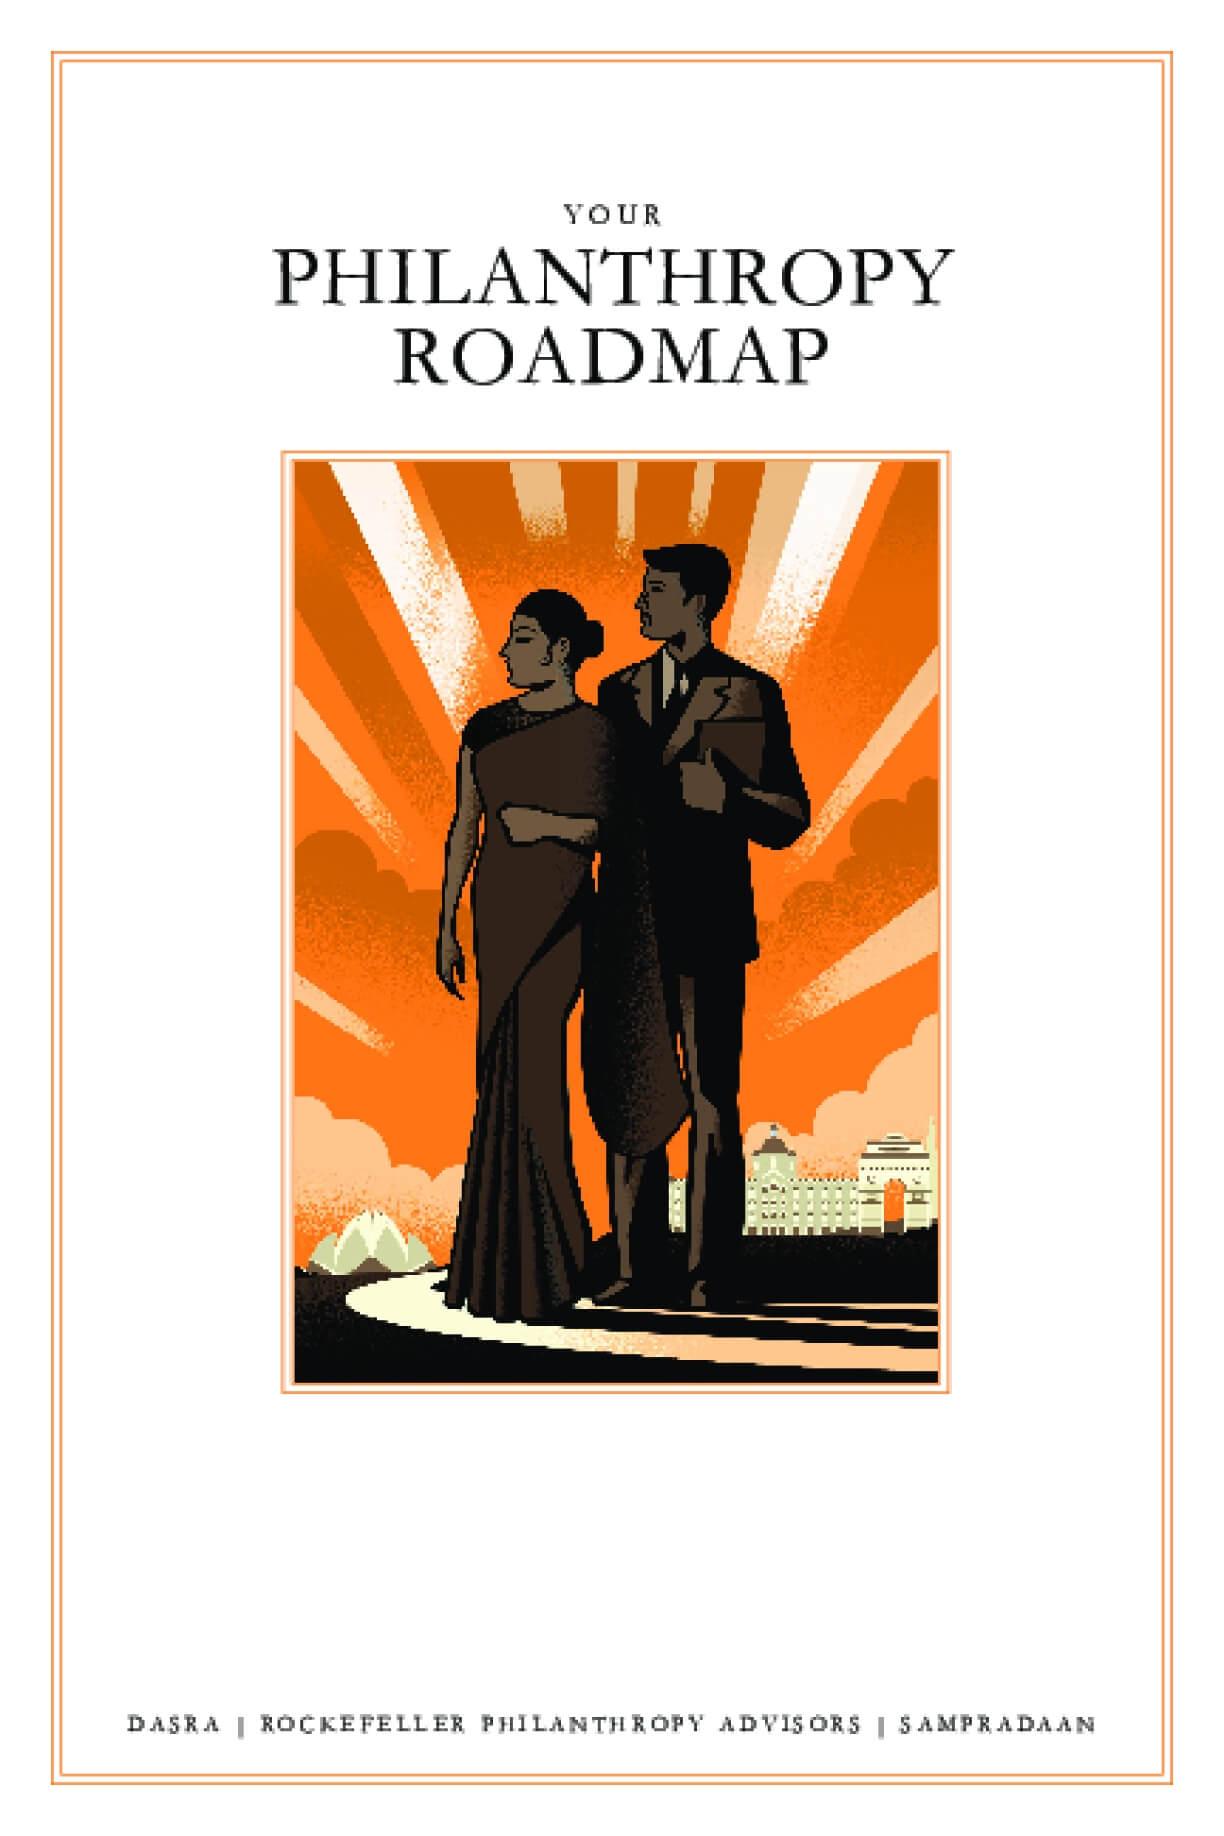 Your Philanthropy Roadmap